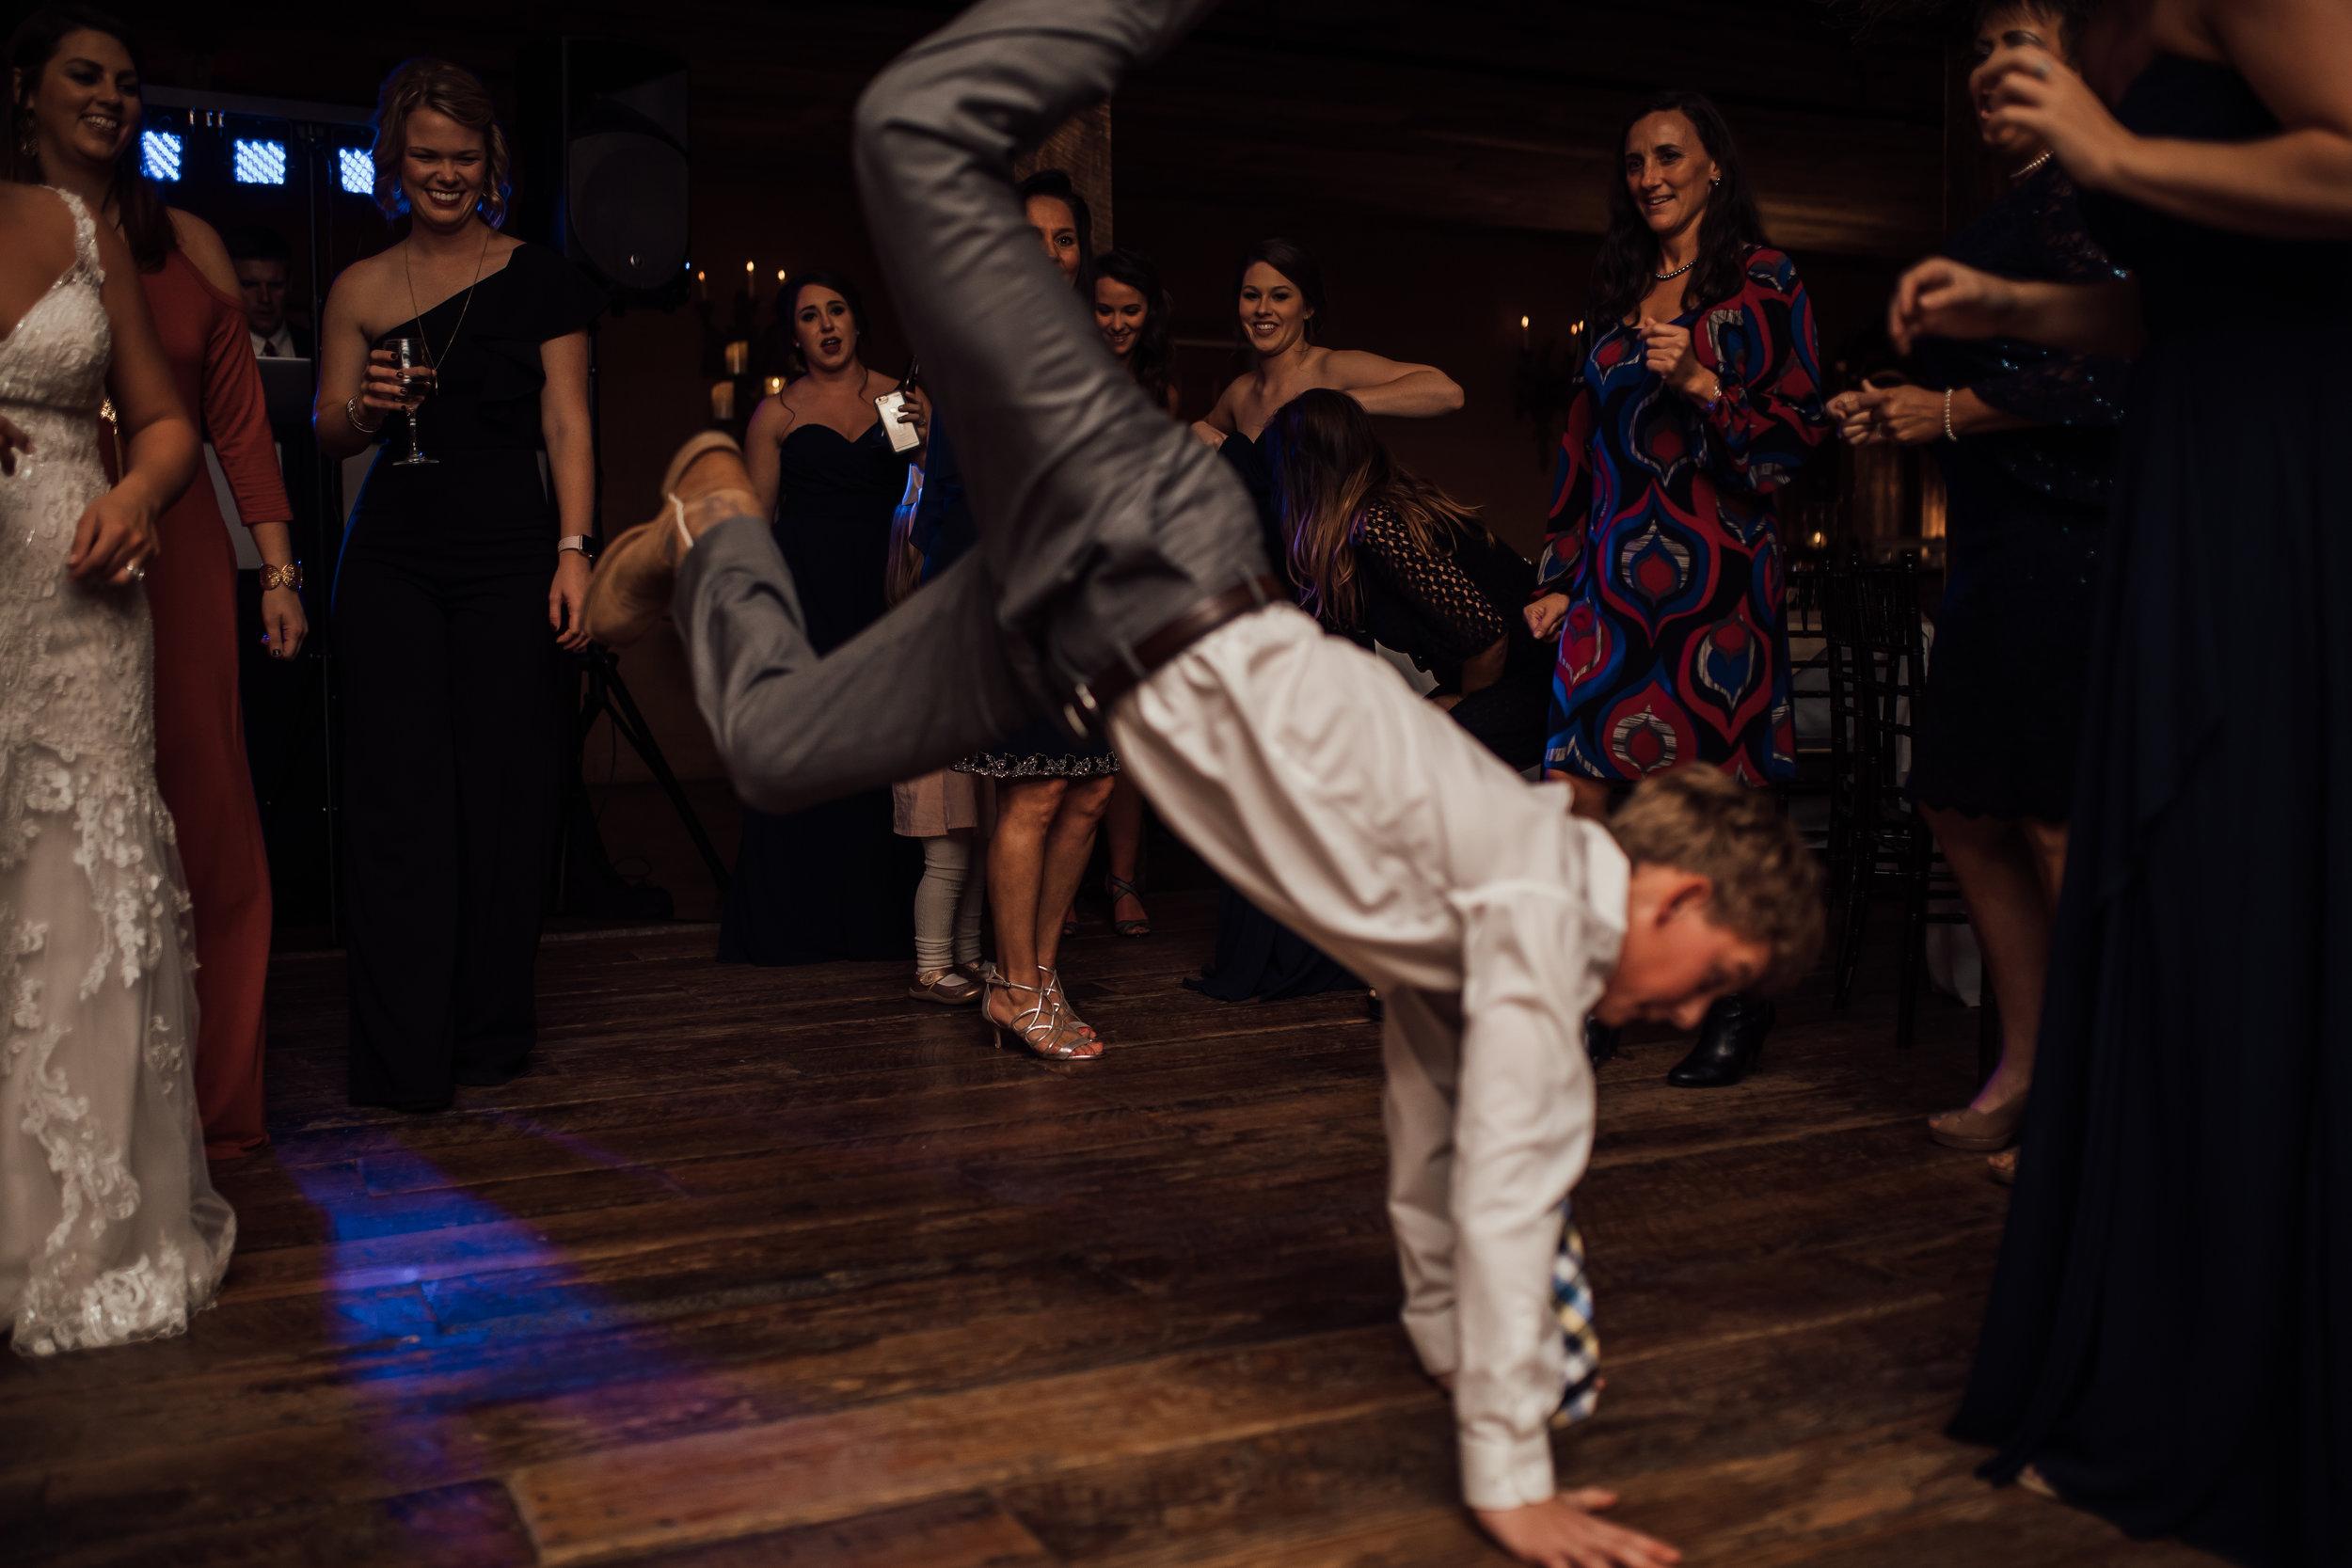 memphis-wedding-photographer-heartwood-hall-wedding-venue-cassie-cook-photography-411.jpg